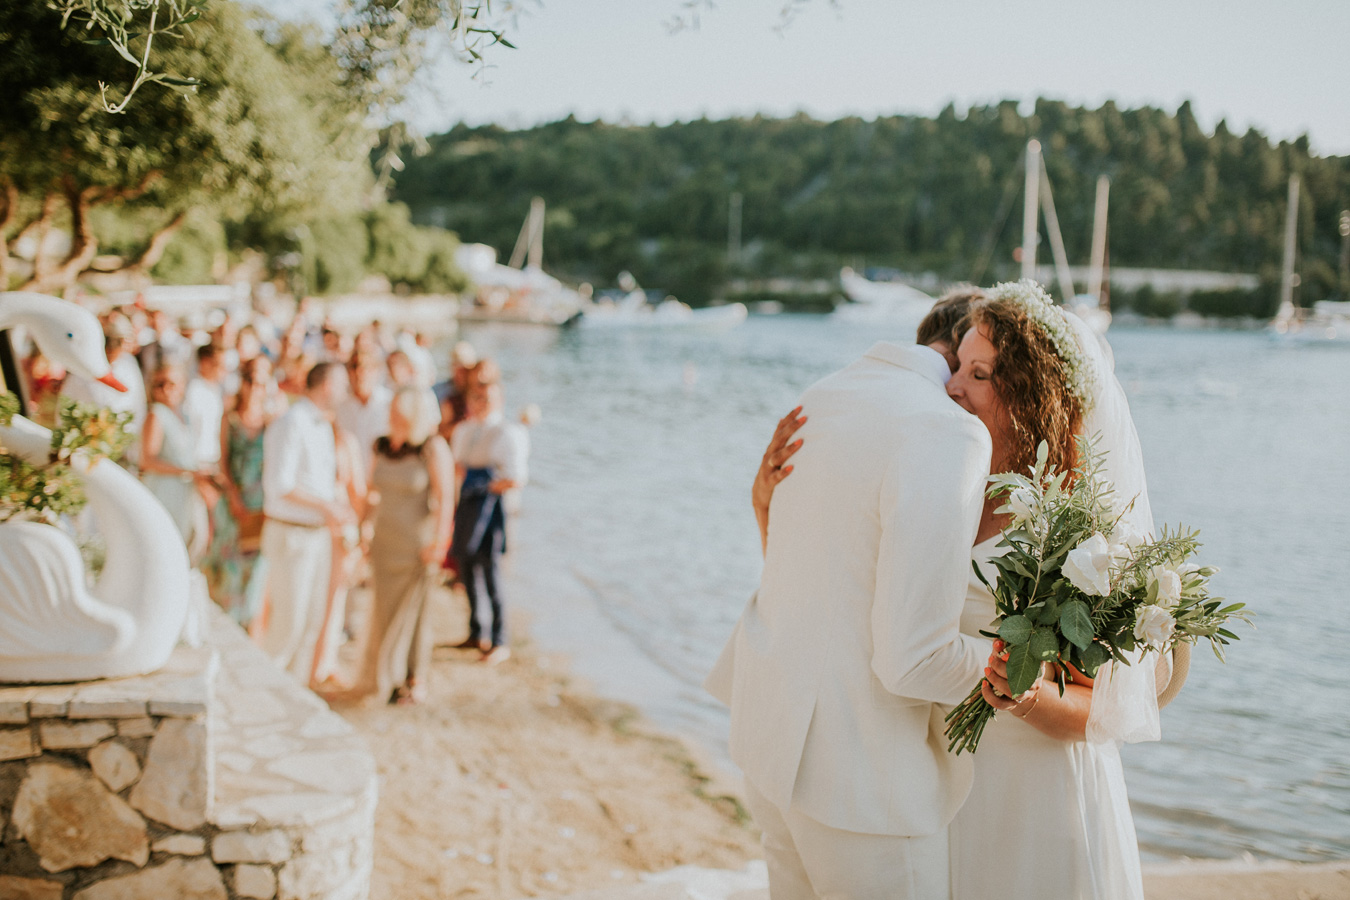 065-bryllupsfotograf-oslo-destinasjonsbryllup-fotograf-tone-tvedt.jpg